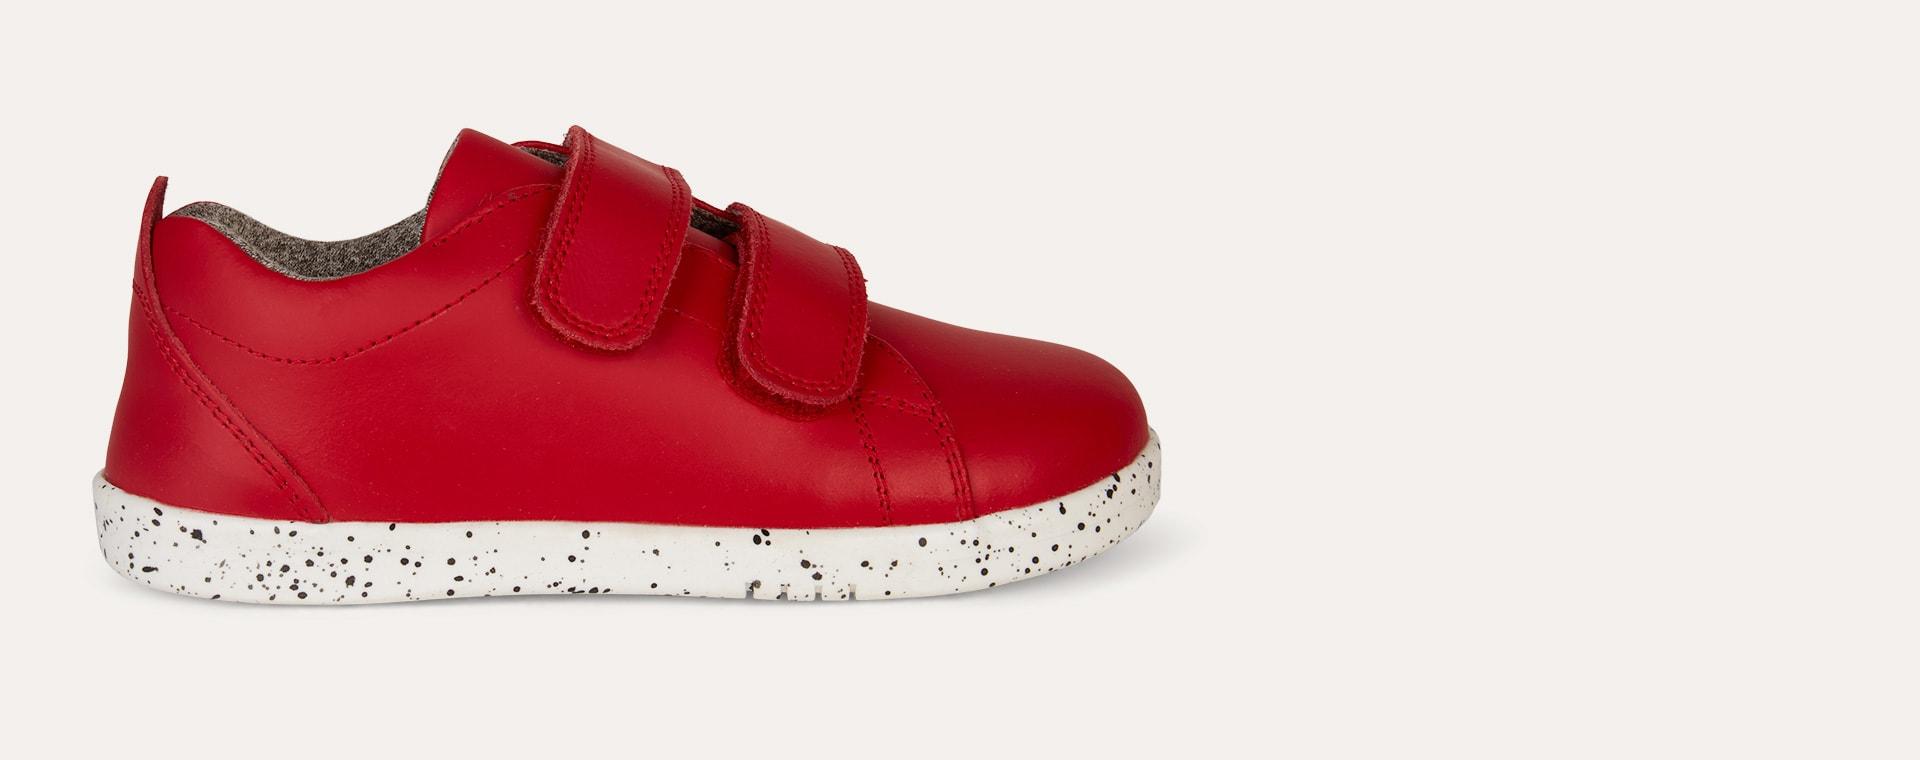 Red Bobux Kid + Grass Court - Waterproof